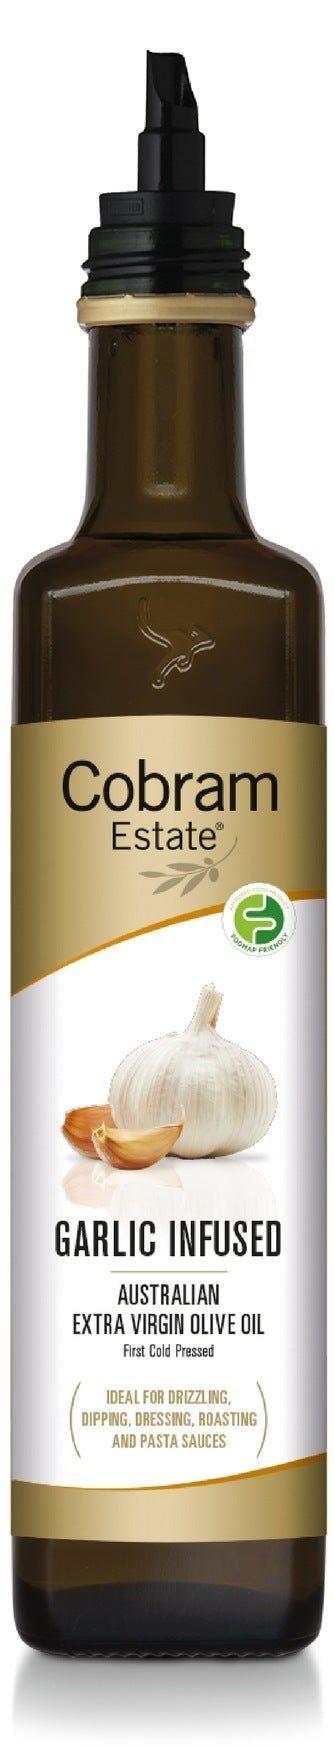 Cobram Estate olive oil review